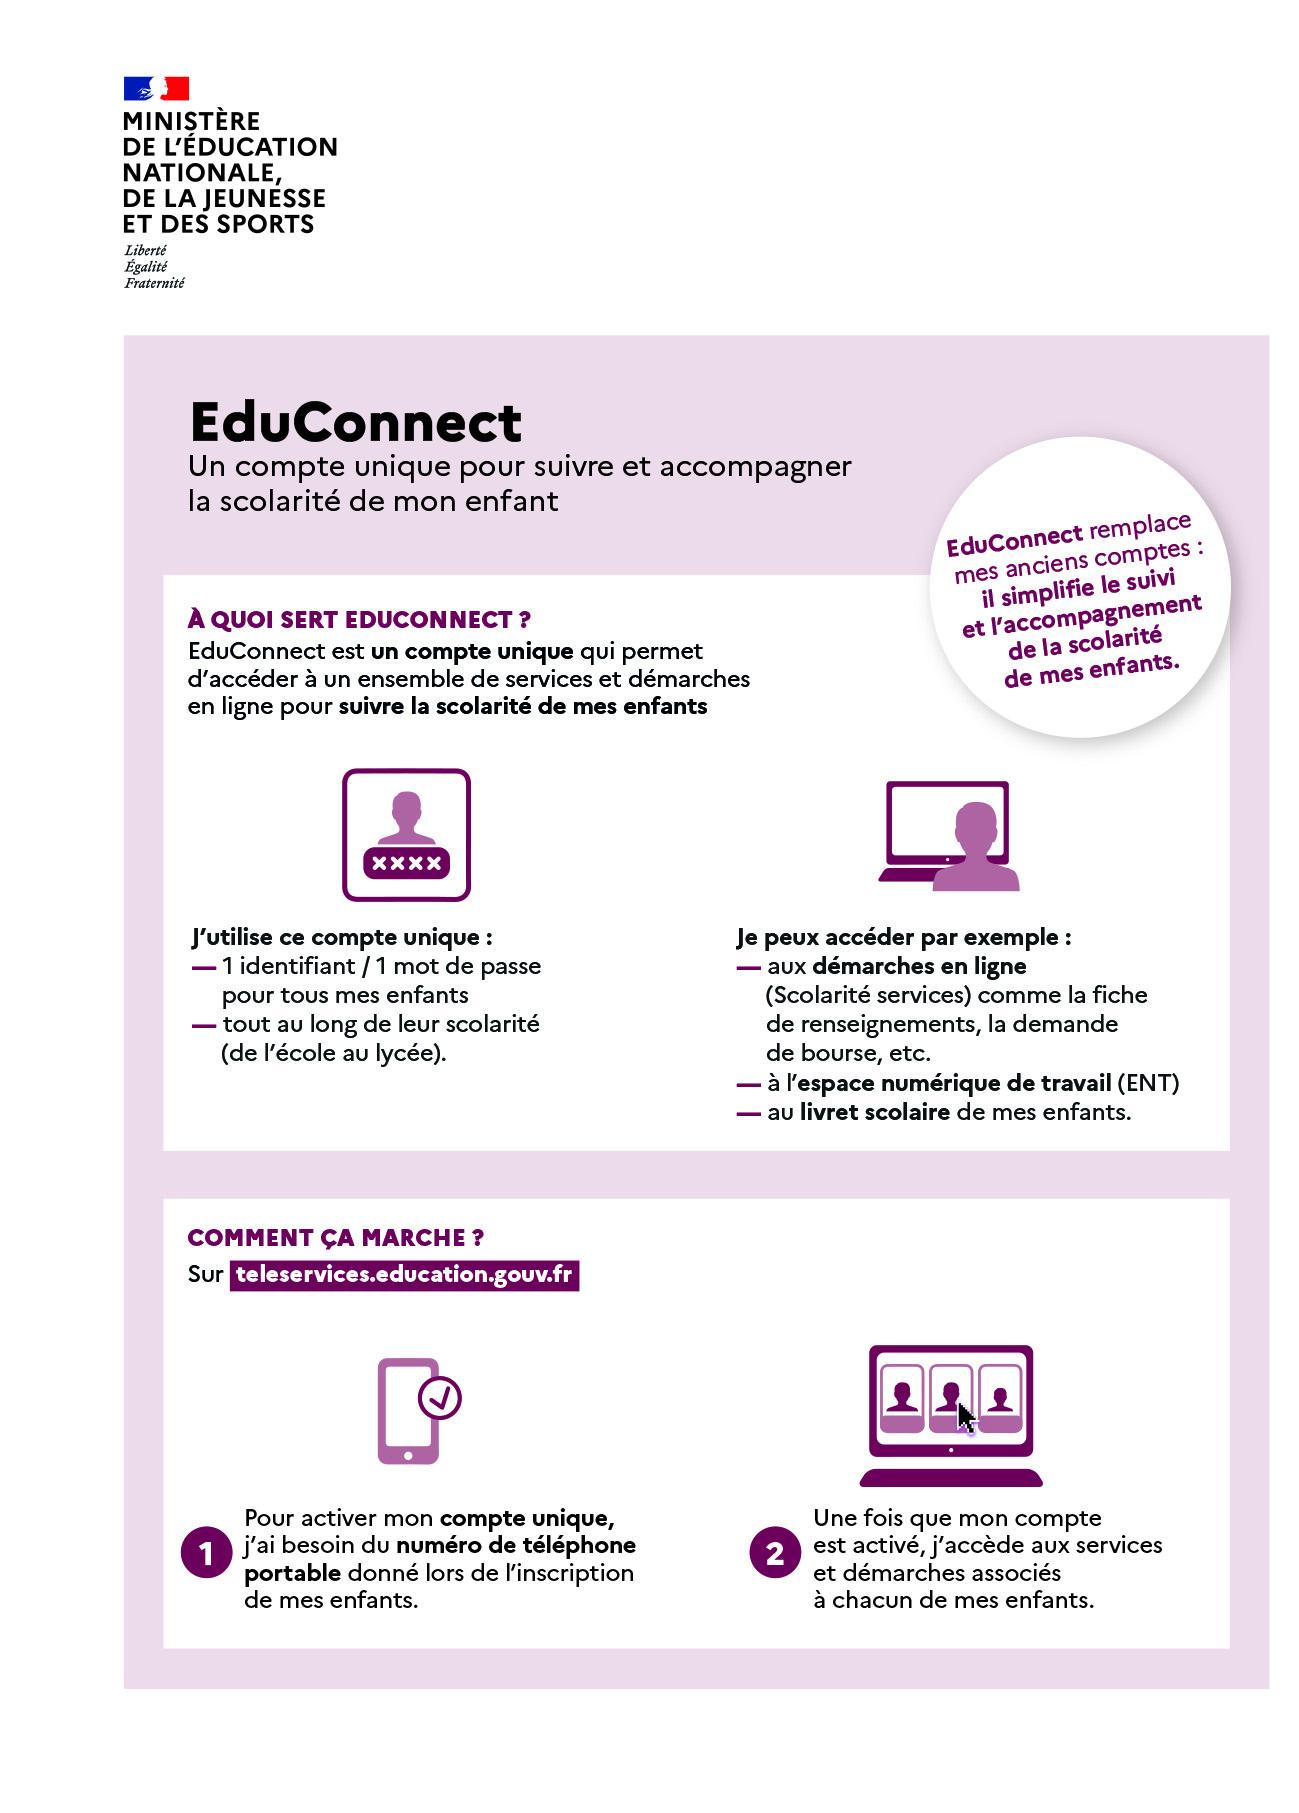 infographie-educonnect-71118.jpg